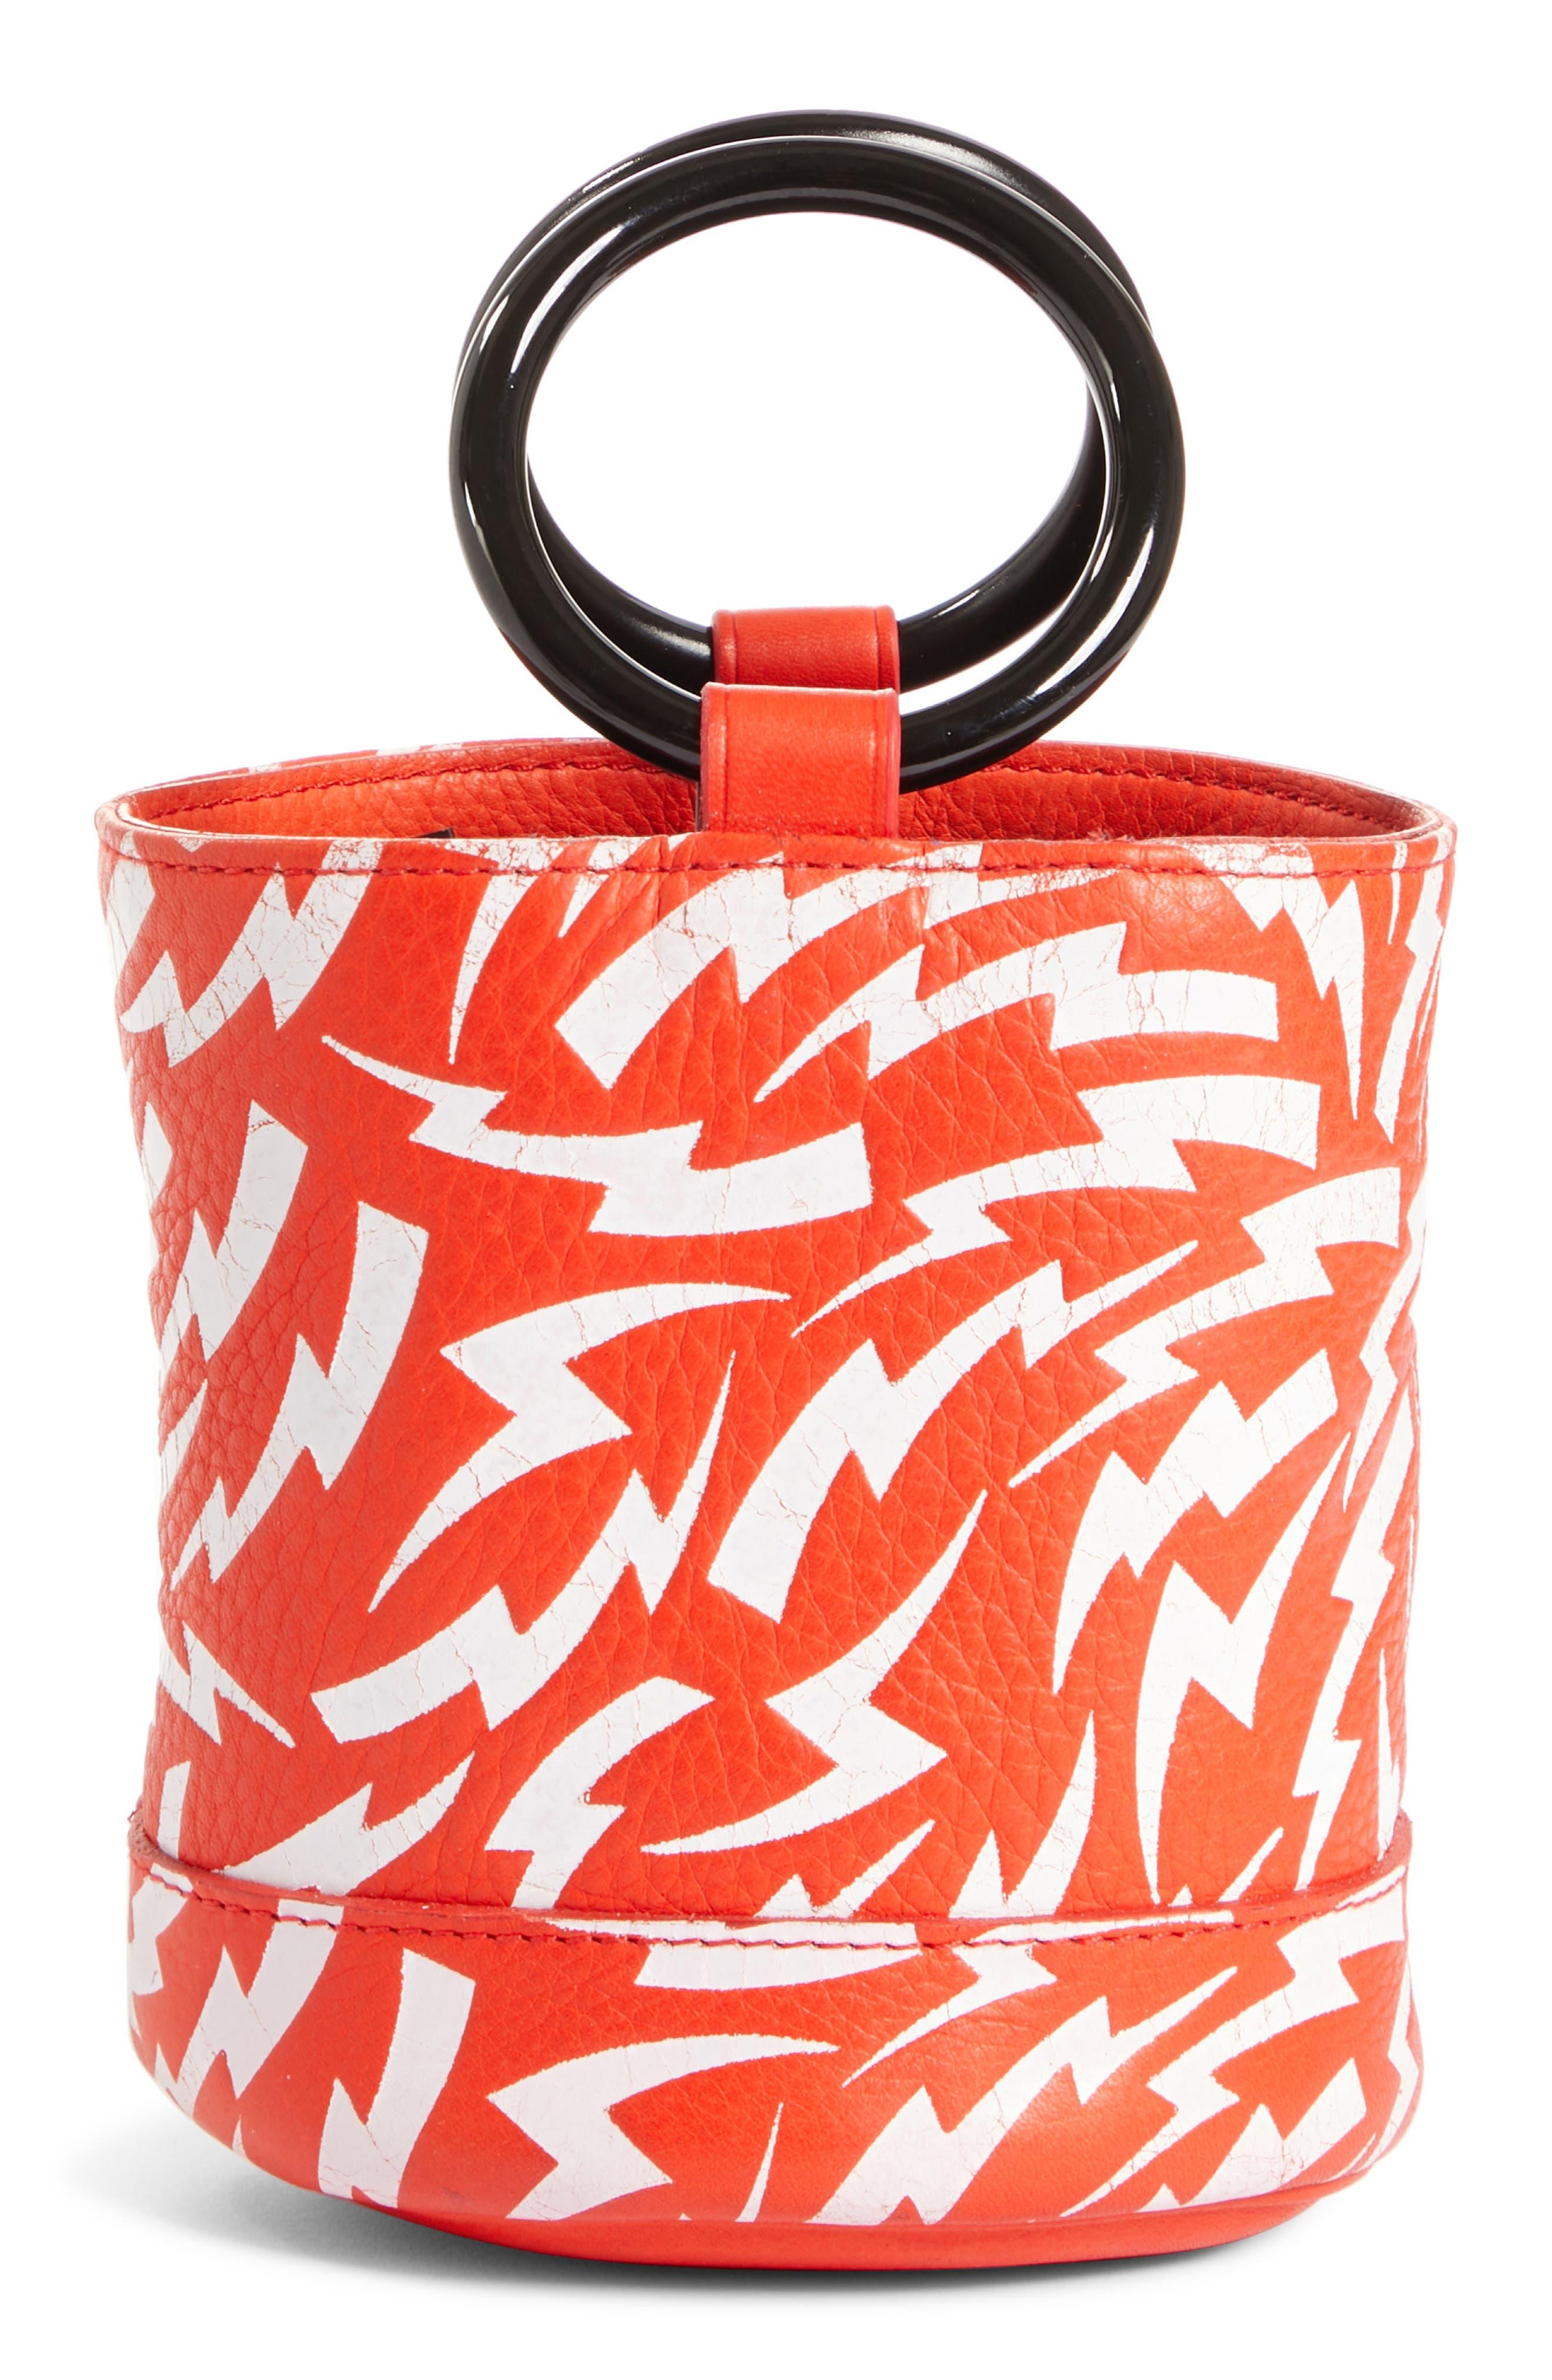 x Paramount Grease Bonsai 15 Lightning Print Bucket Bag,                             Main thumbnail 1, color,                             WHITE LIGHTNING BOLT